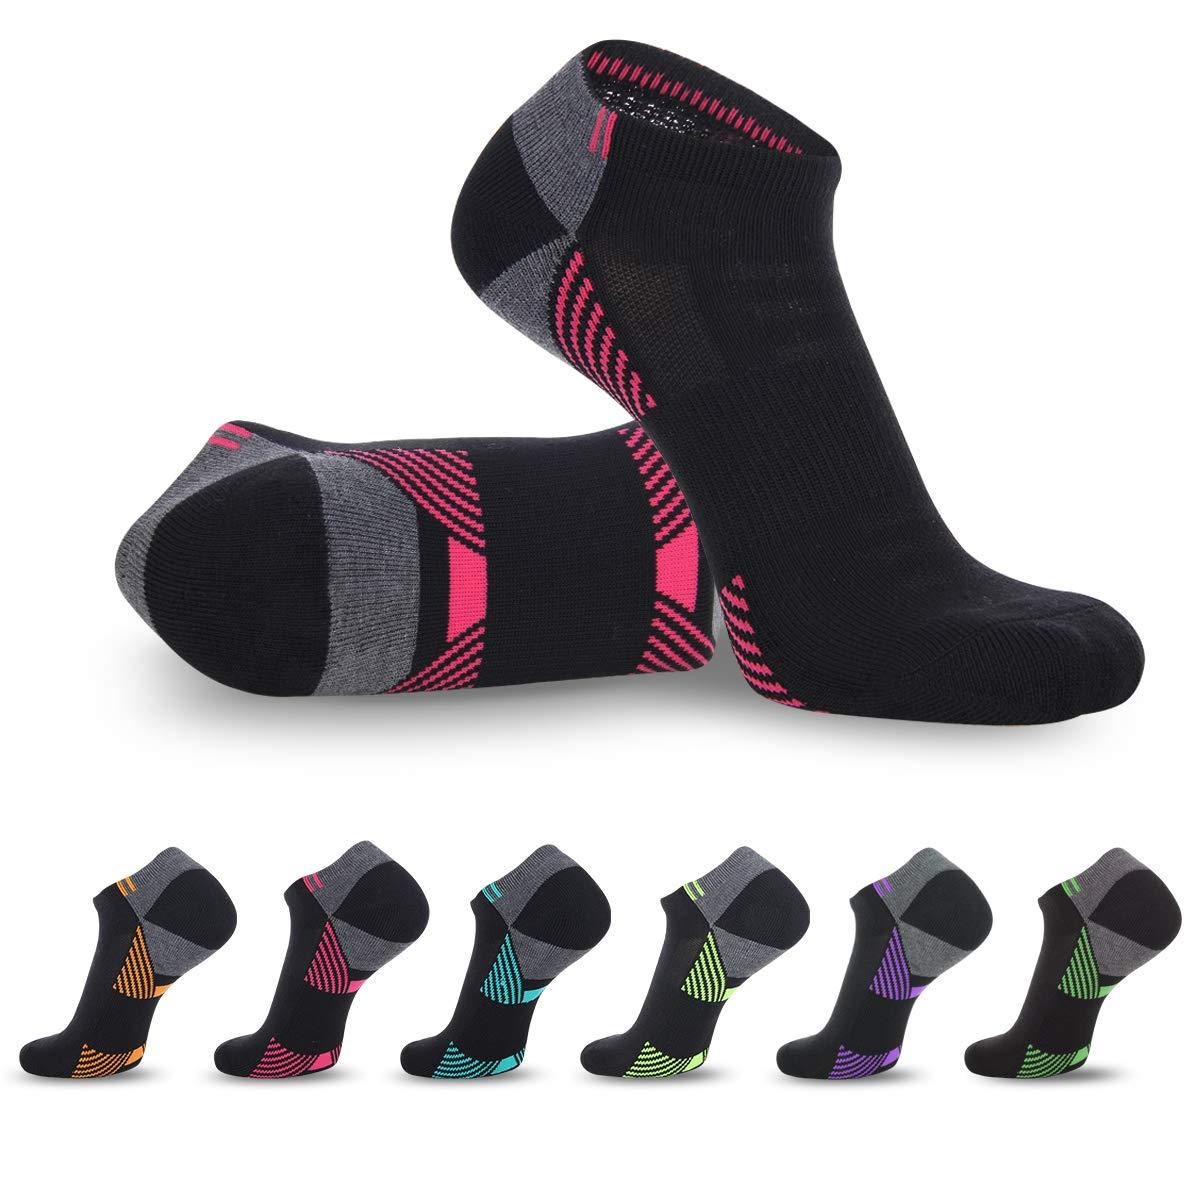 LITERRA Womens 6 Pack No Show Running Athletic Socks Low Cut Sports Cushioned Performance Sock (Black)